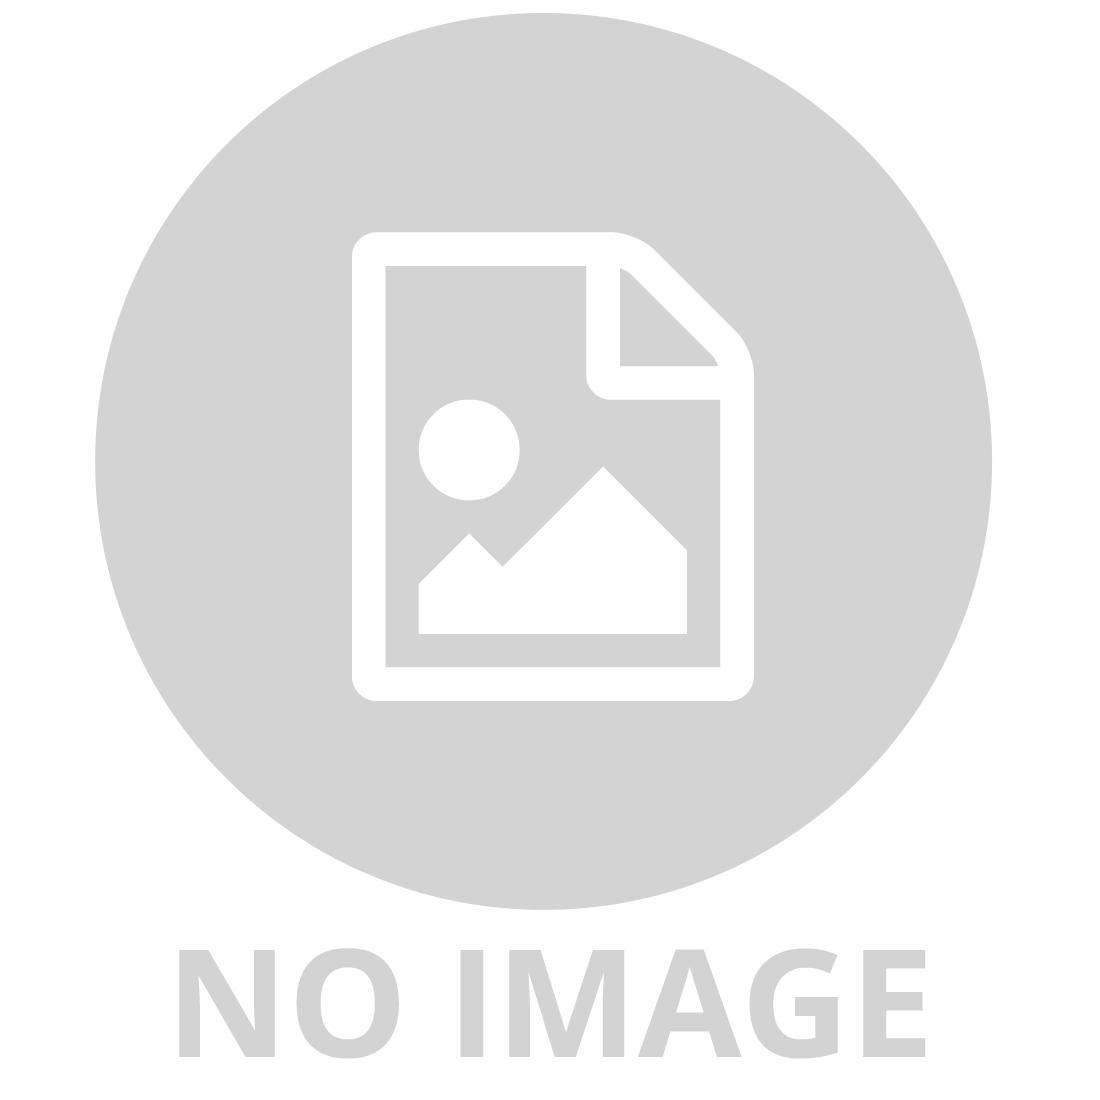 RAVENSBURGER 100PC JIGSAW PUZZLE FAIRY PLAYLAND